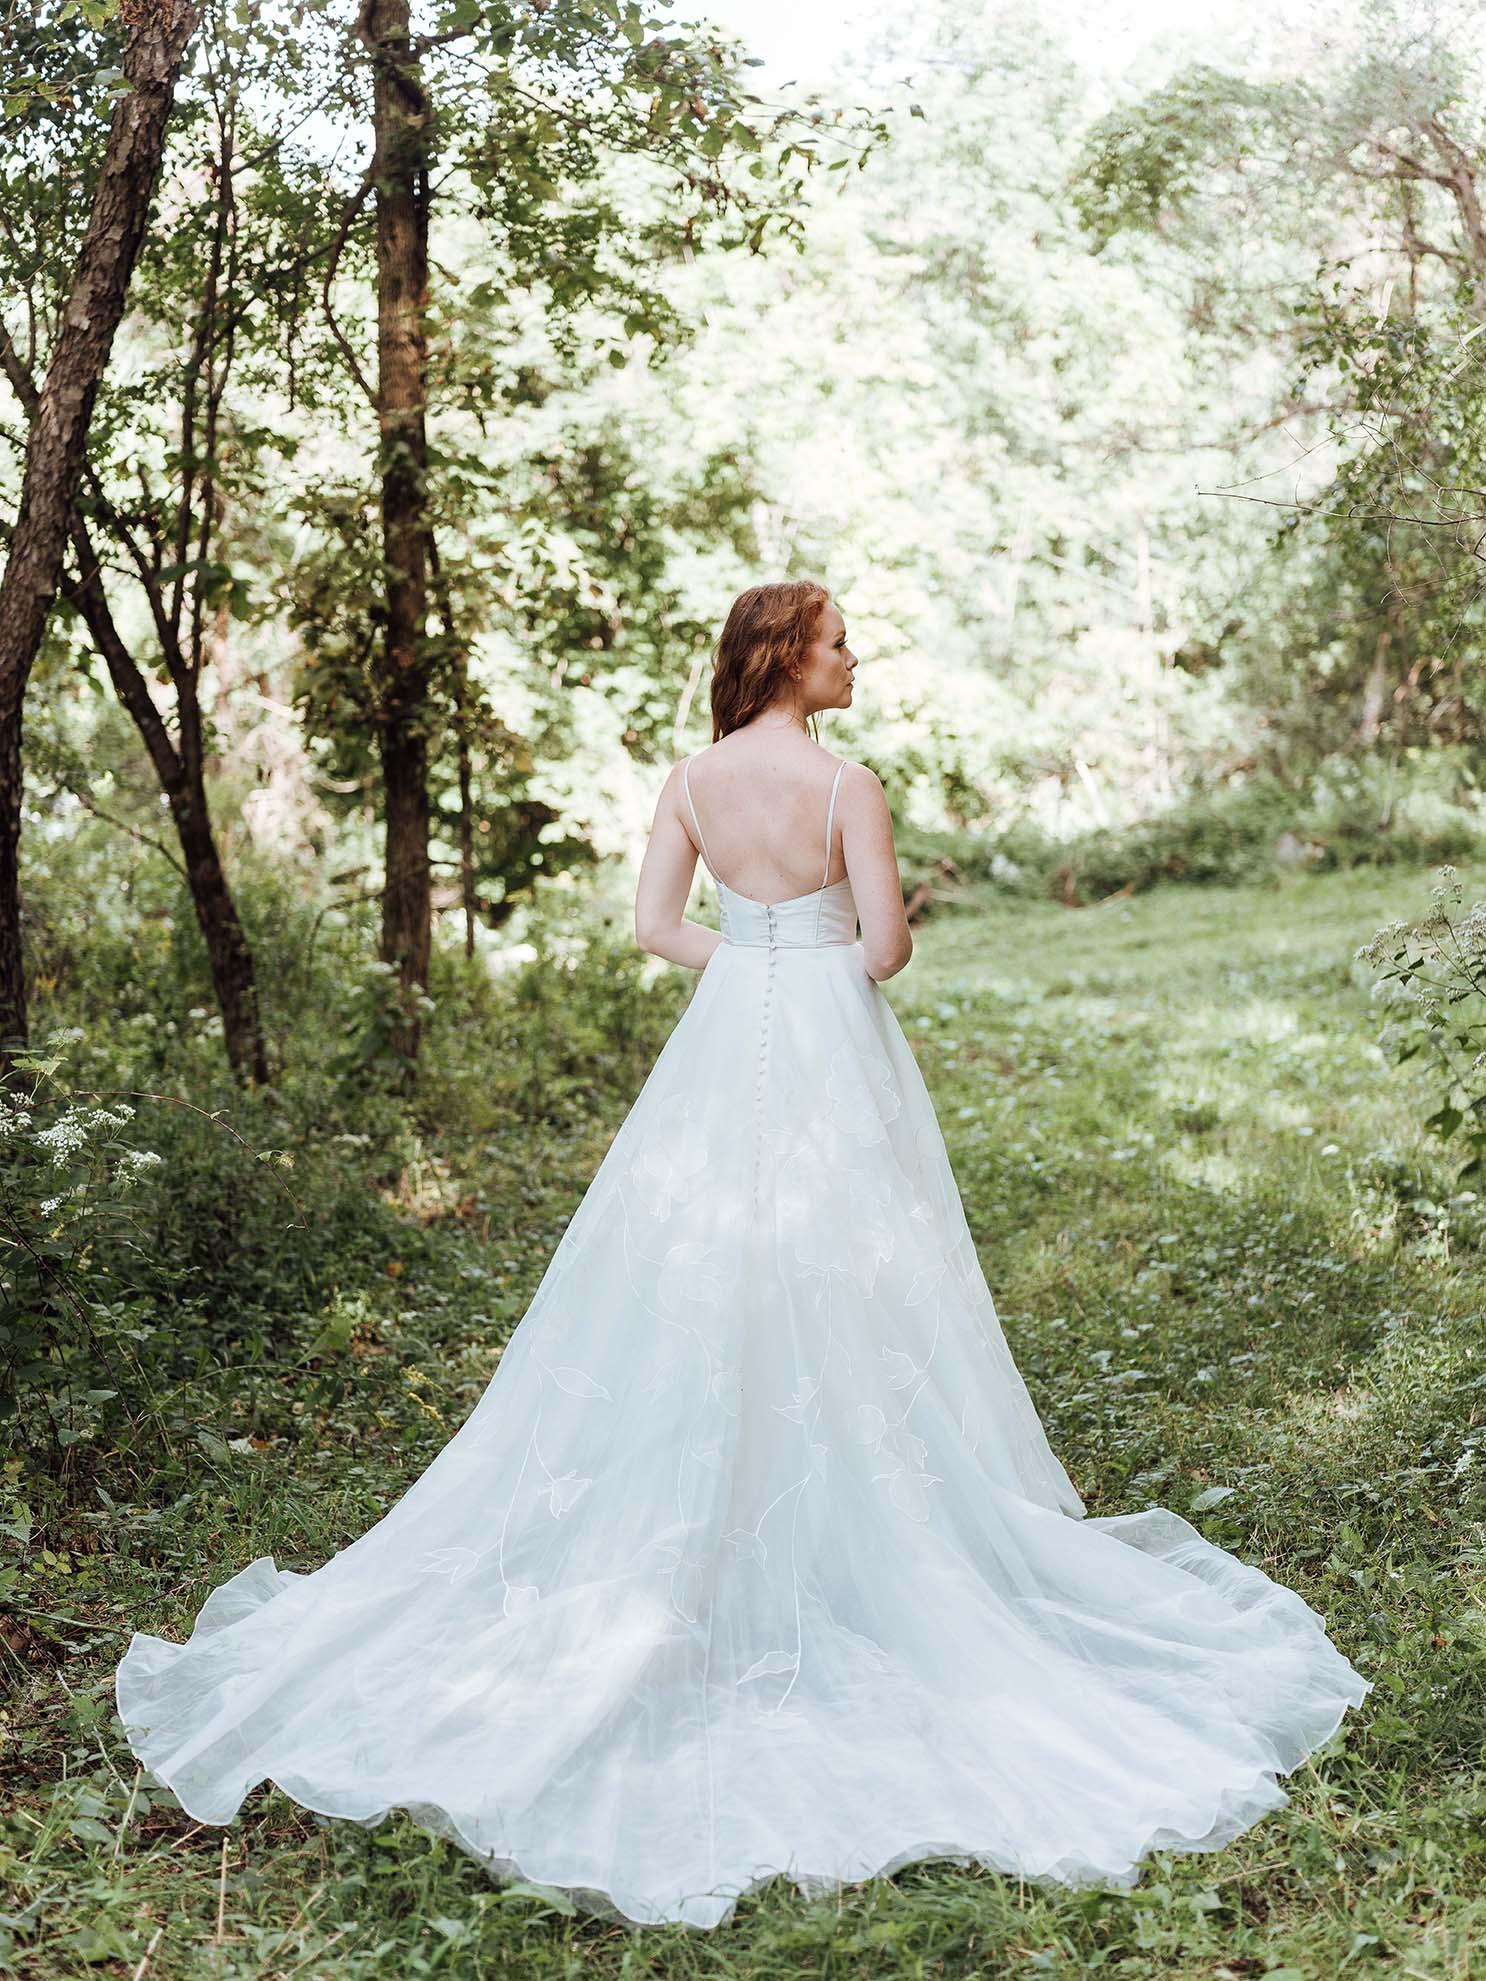 WSPCo-Gather-Greene-Rebecca-Schoneveld-Bridal-478_wedding_ballgown_flower_designs_boho.jpg